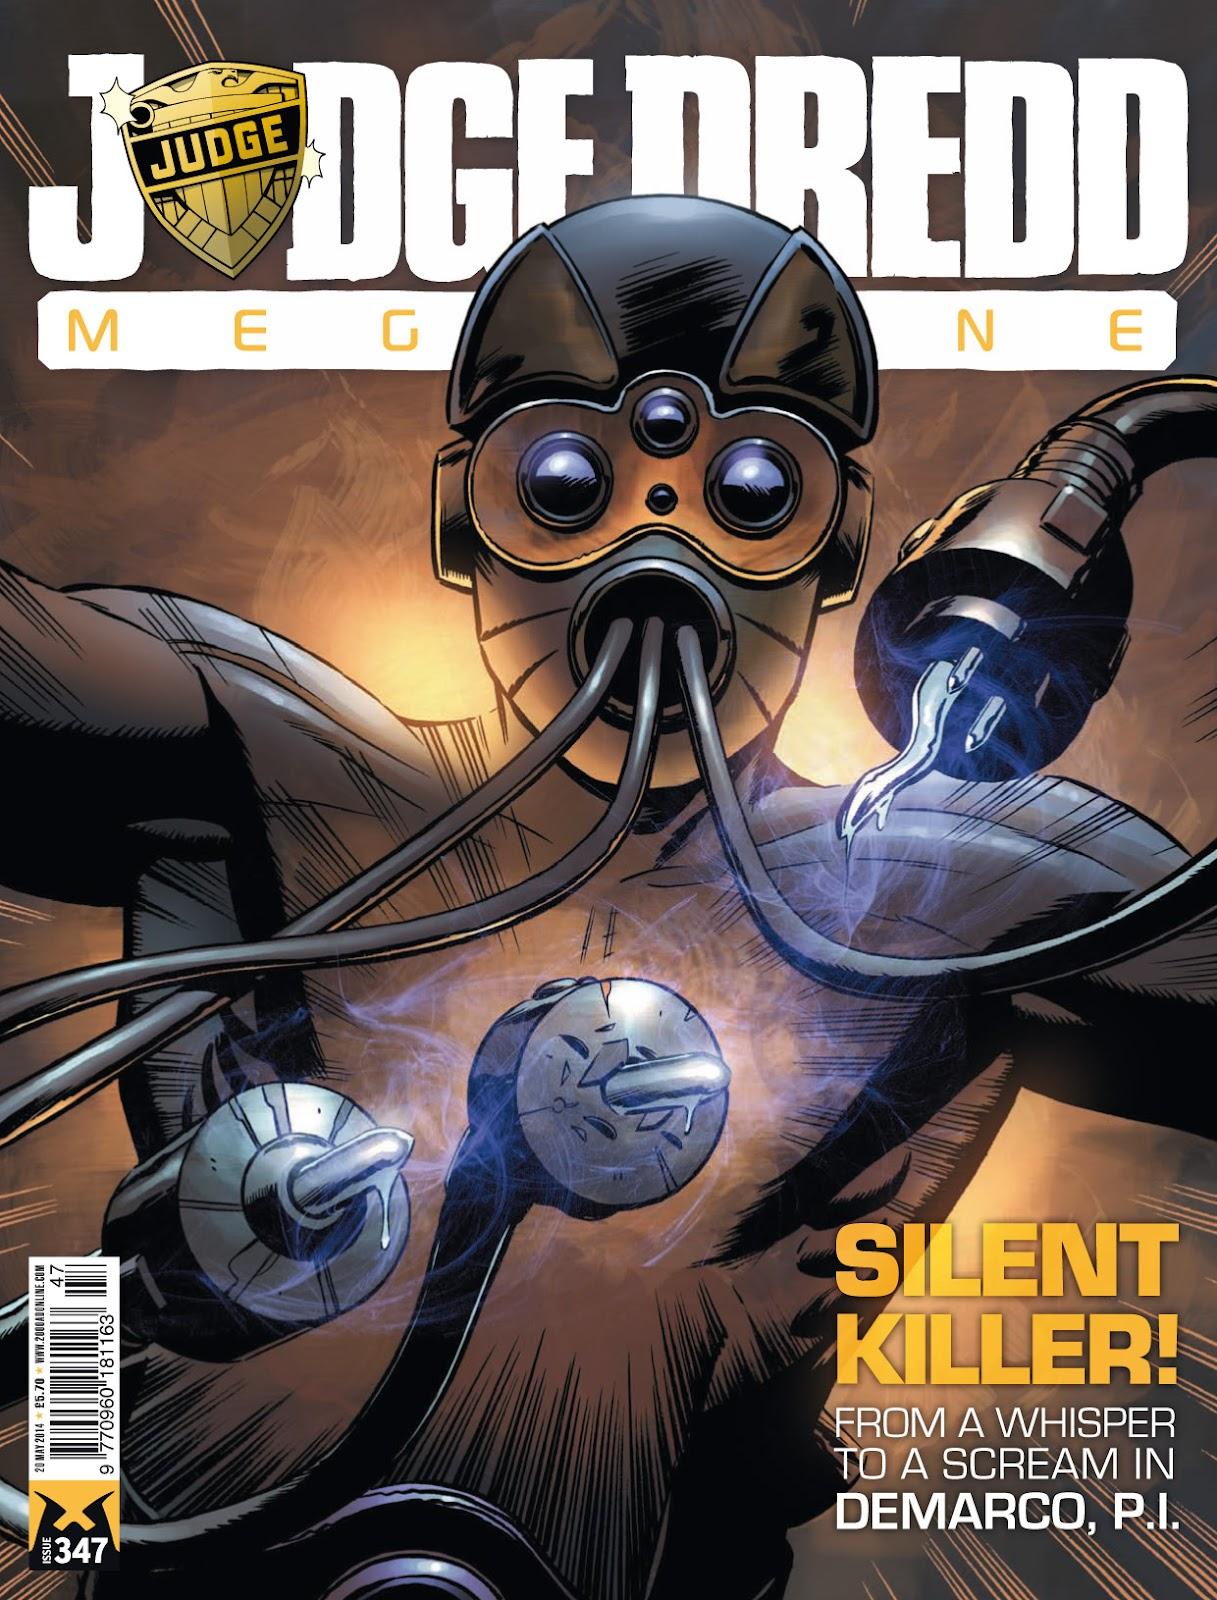 Judge Dredd Megazine (Vol. 5) issue 347 - Page 1